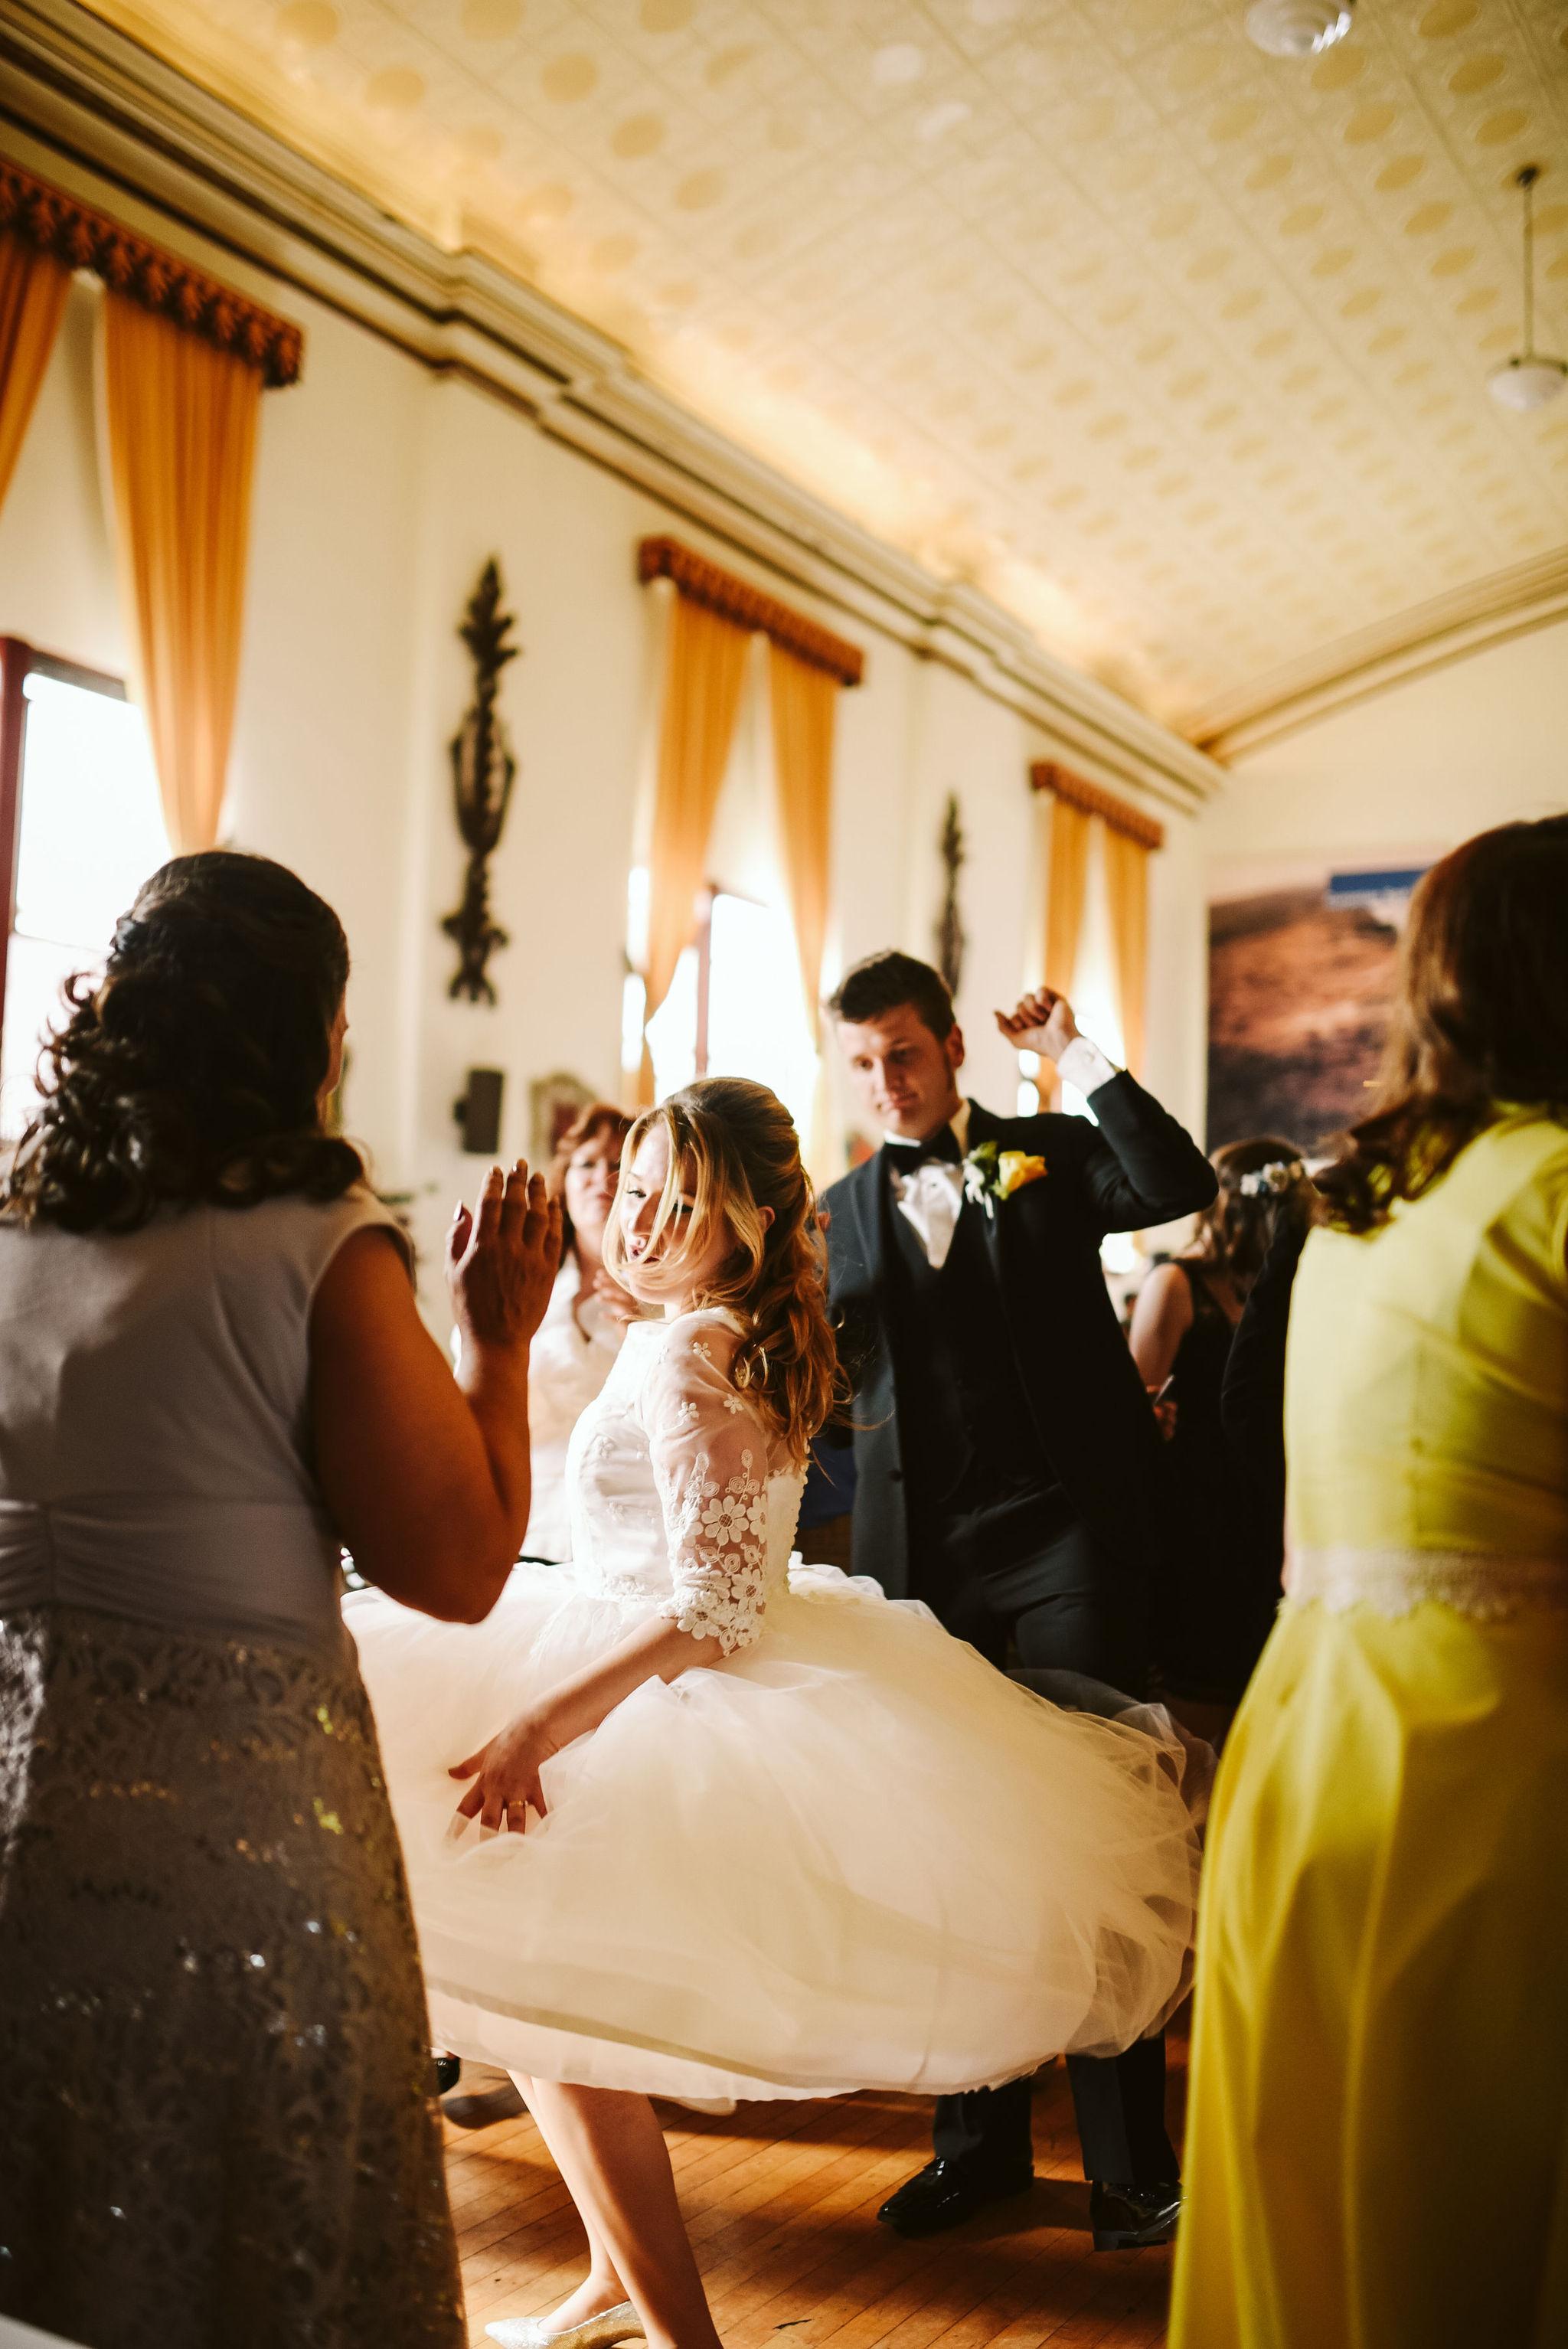 Baltimore, Lithuanian Dance Hall, Maryland Wedding Photographer, Vintage, Classic, 50s Style, Wedding Reception, Beautiful Bride Twirling on Dancefloor